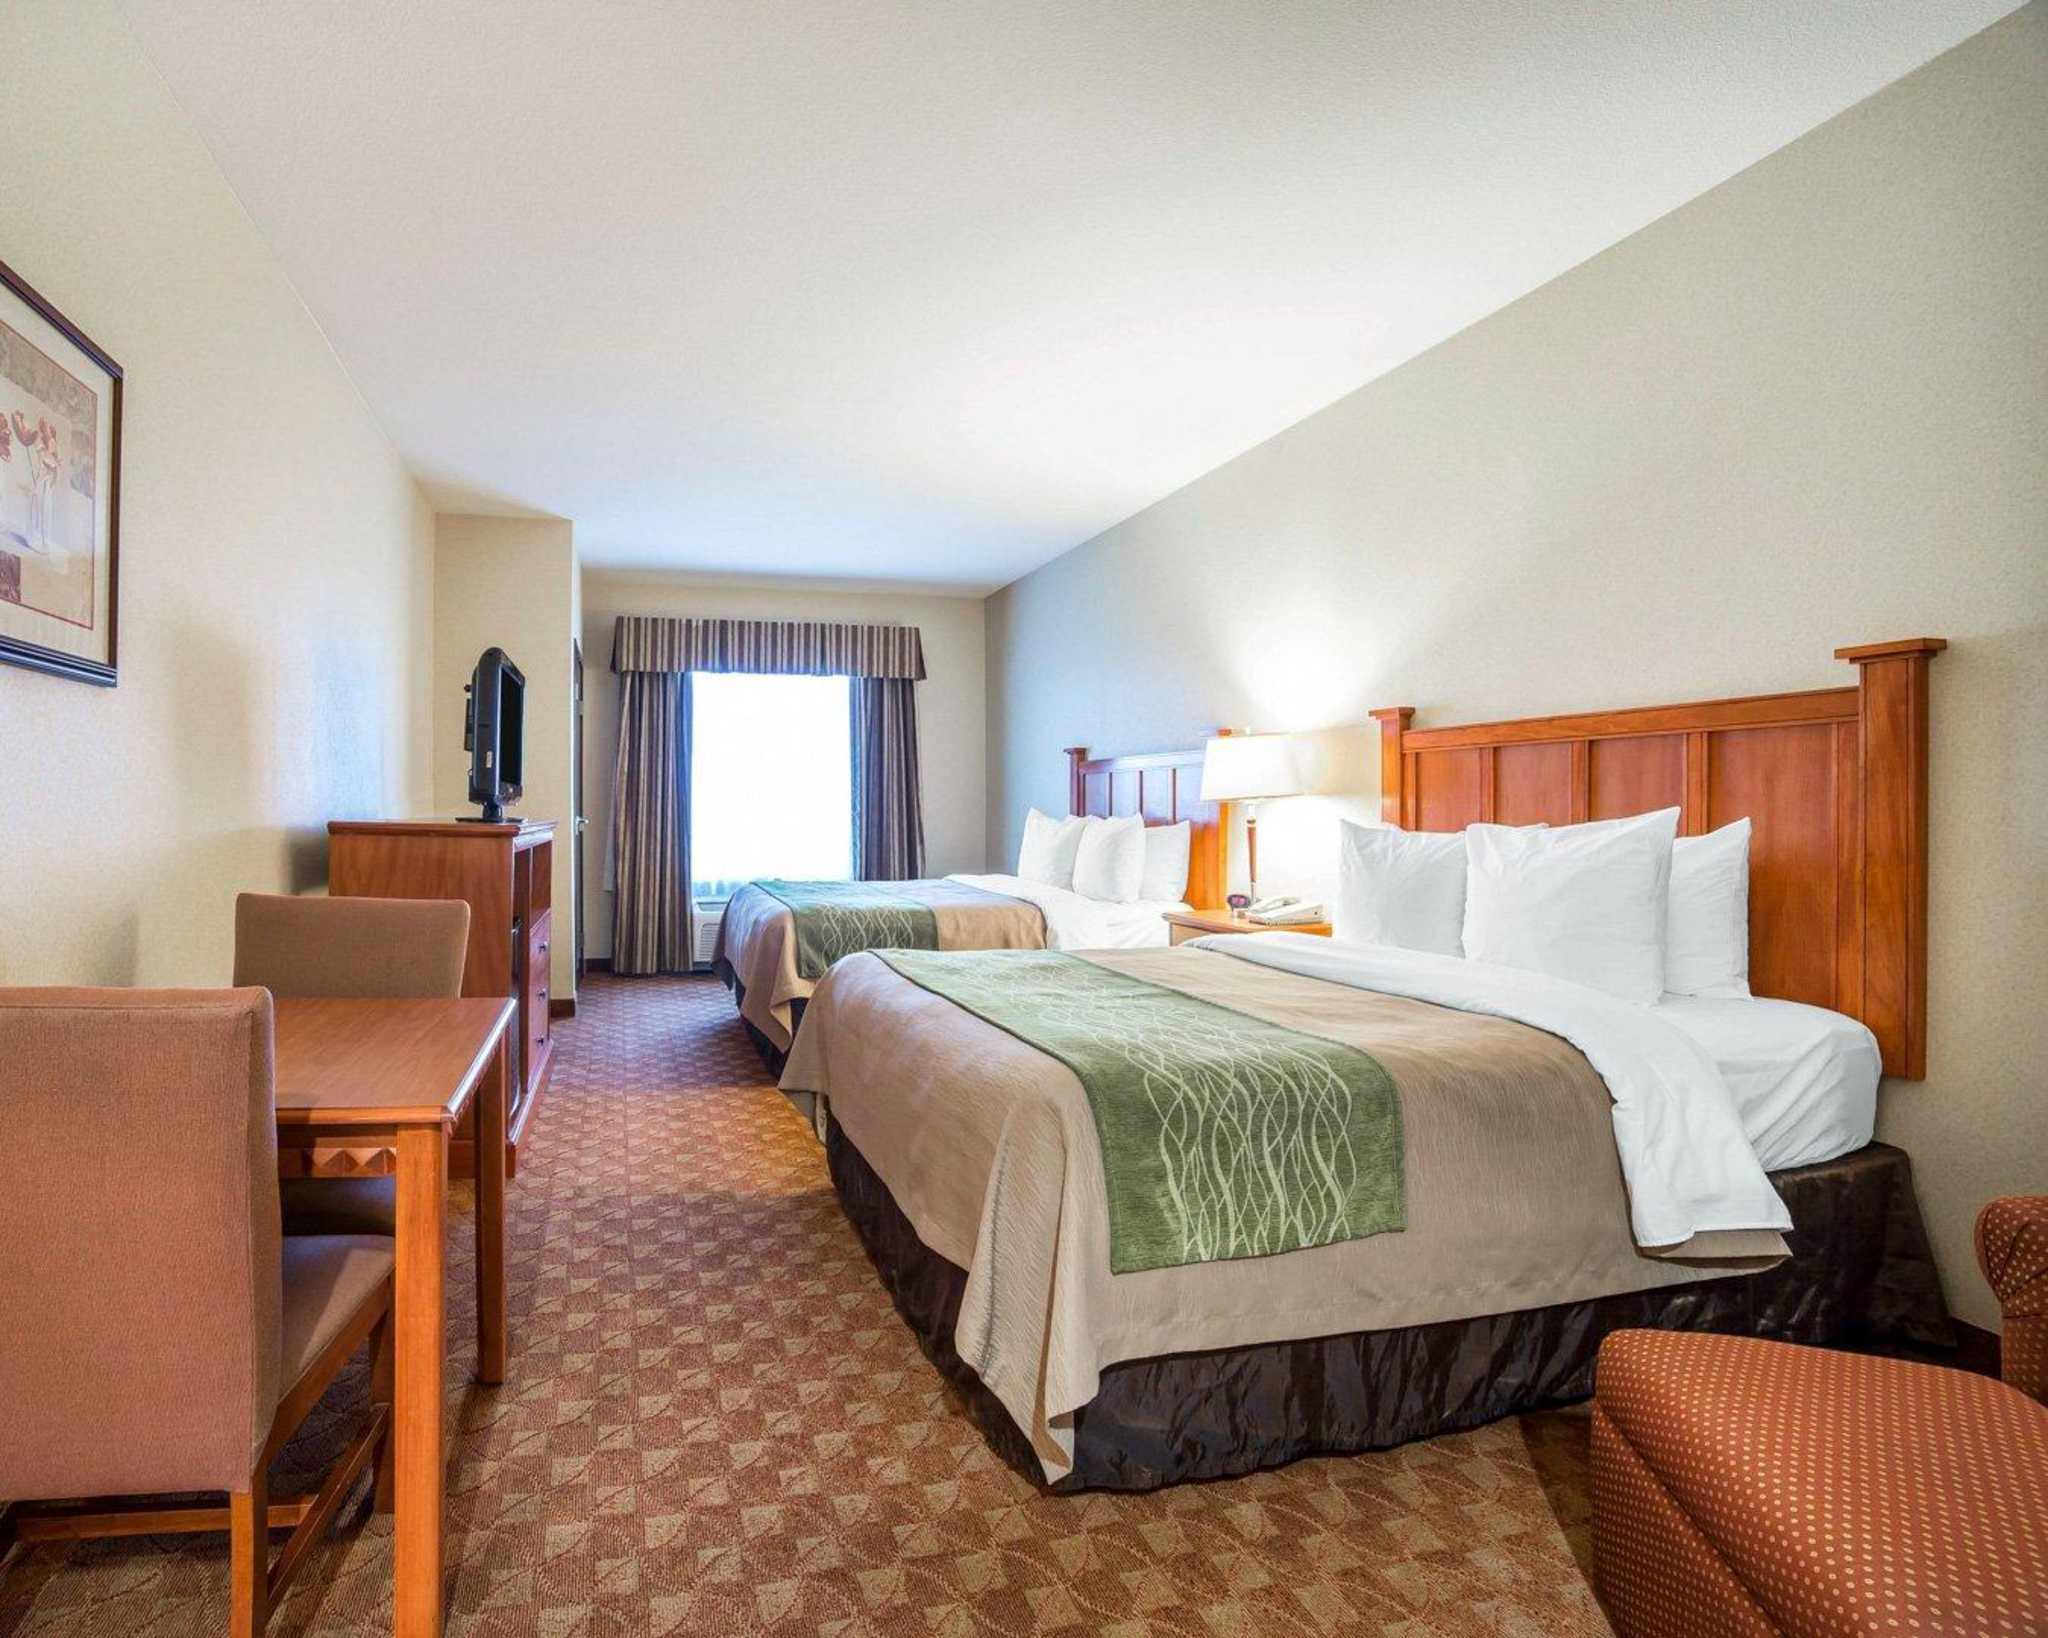 Comfort Inn & Suites Las Vegas - Nellis image 13